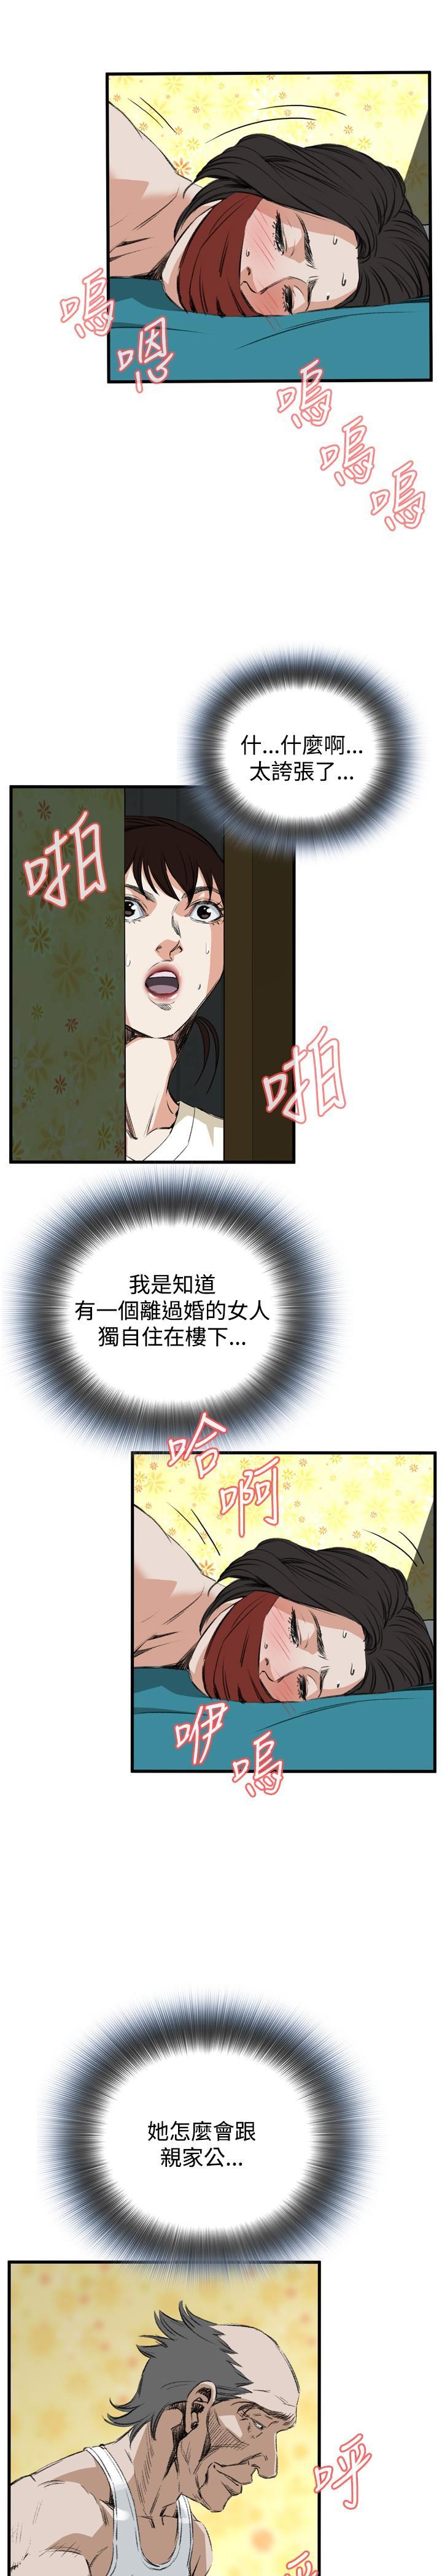 Take a Peek 偷窥 Ch.39~55 [Chinese]中文 161